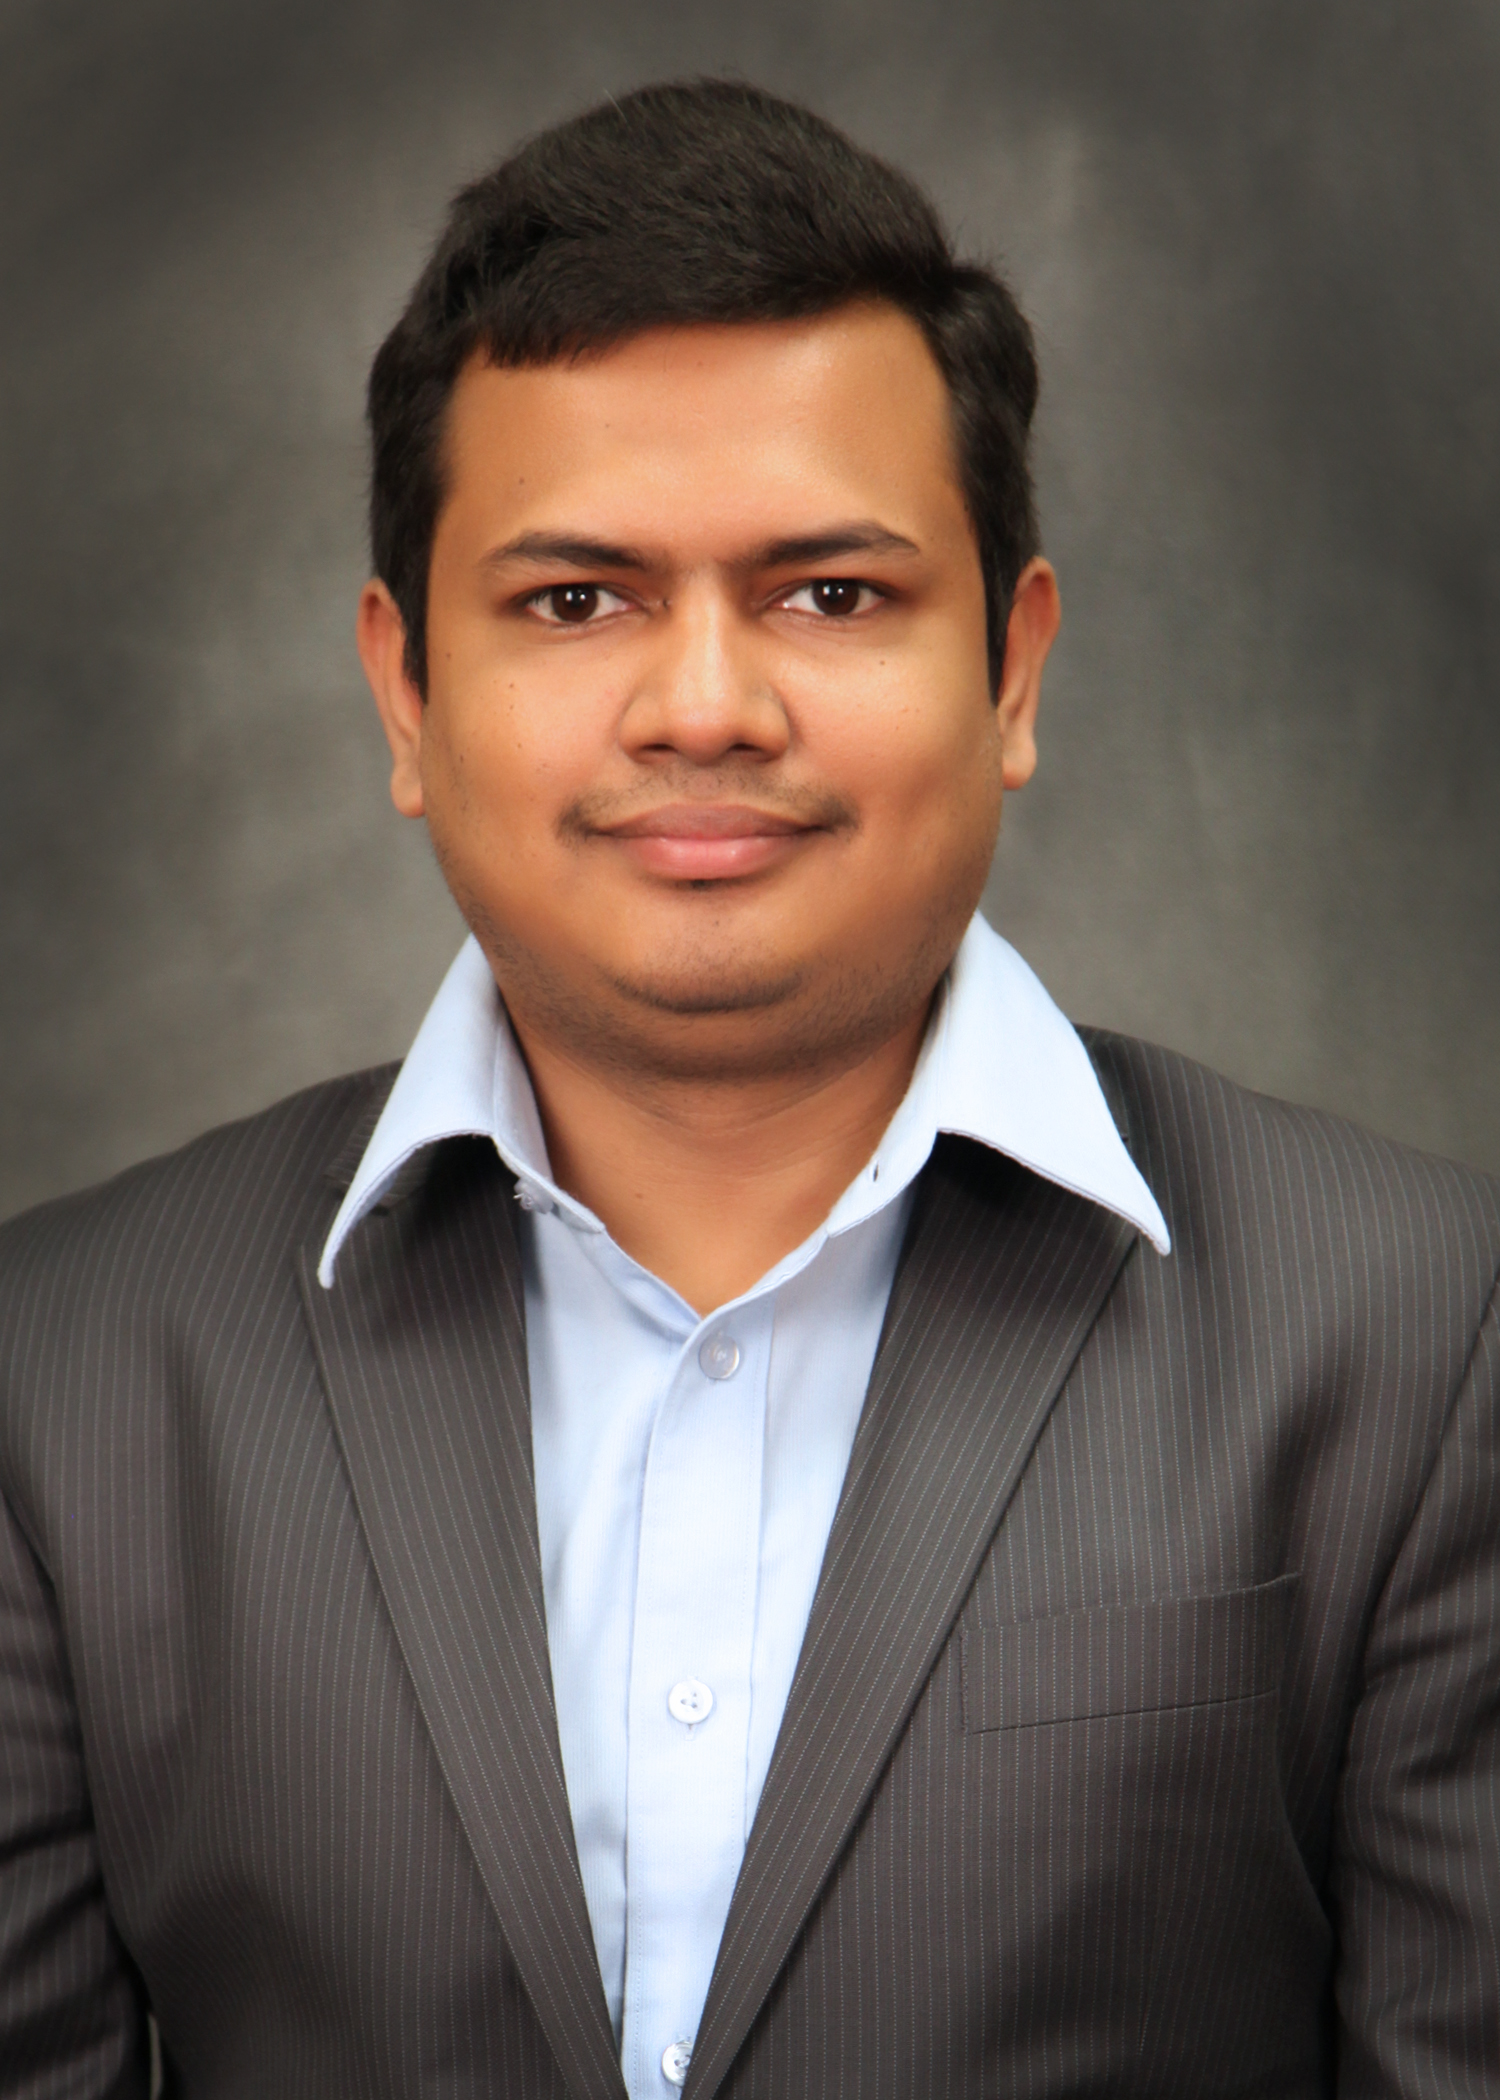 tanveer-hossain-bhuiyan